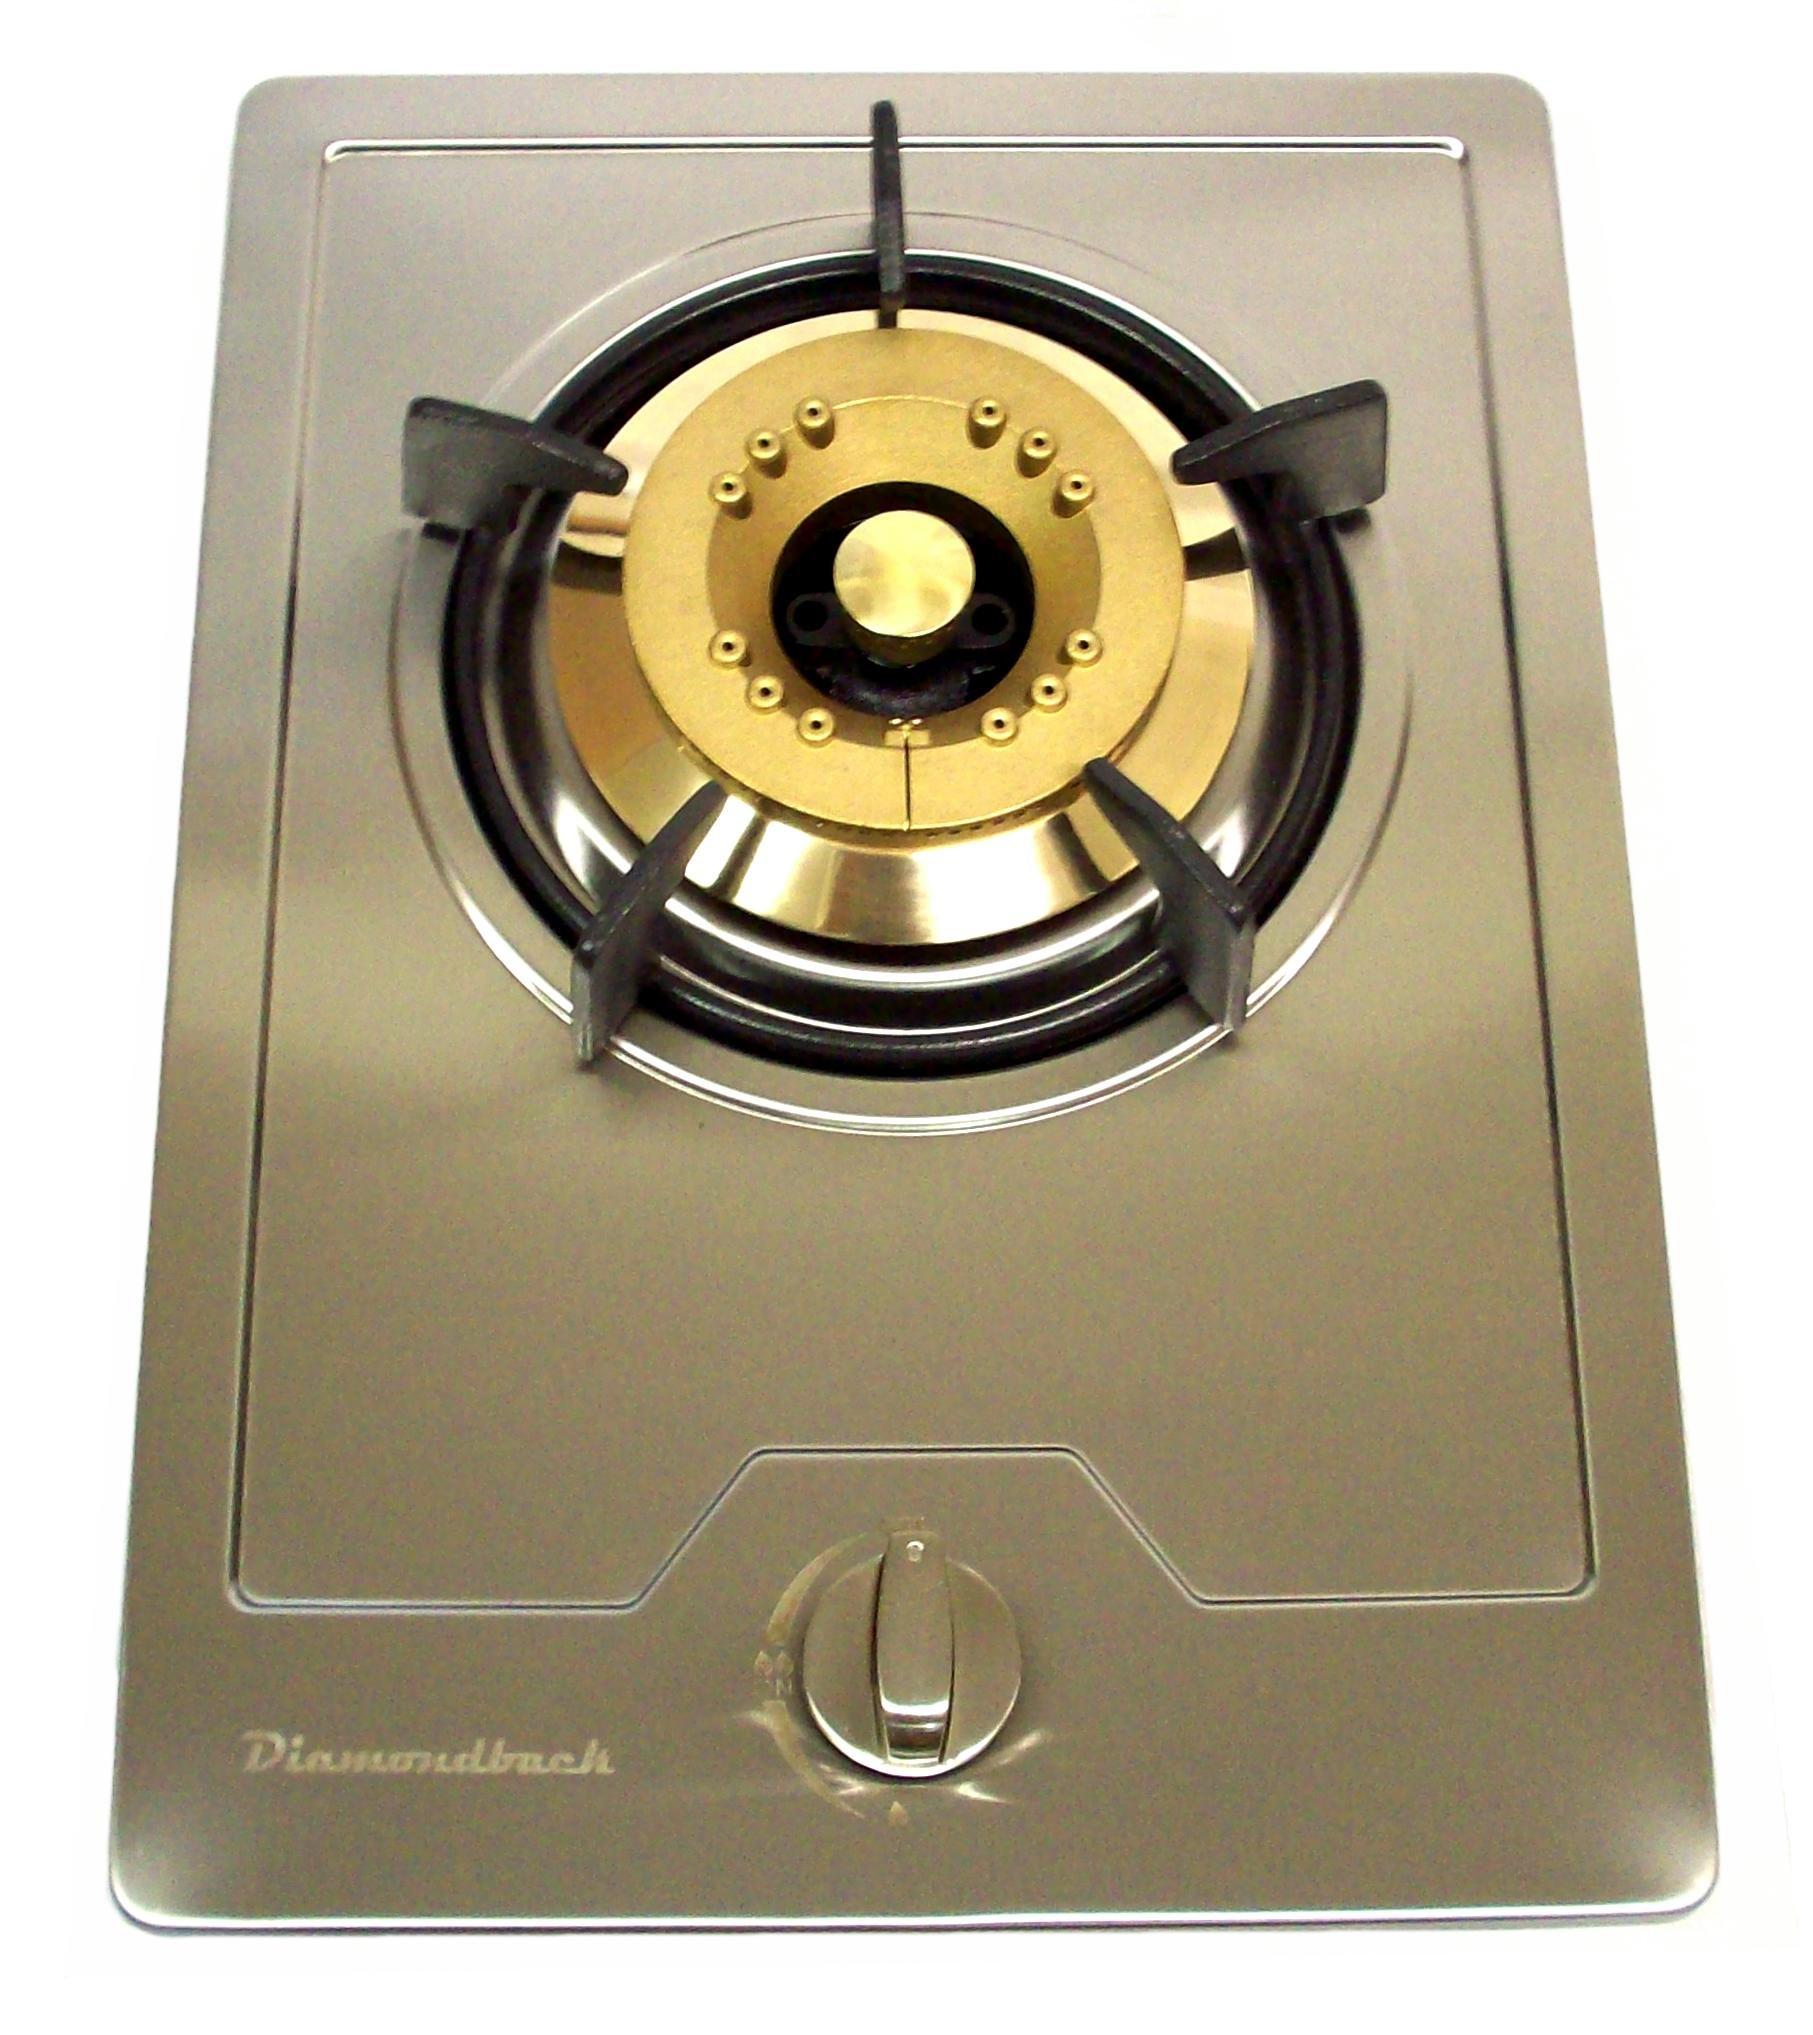 DiamondBack Side Burner/Grill/Built-in/Propane/LP/Natural Gas/Drop/Stainless/NG